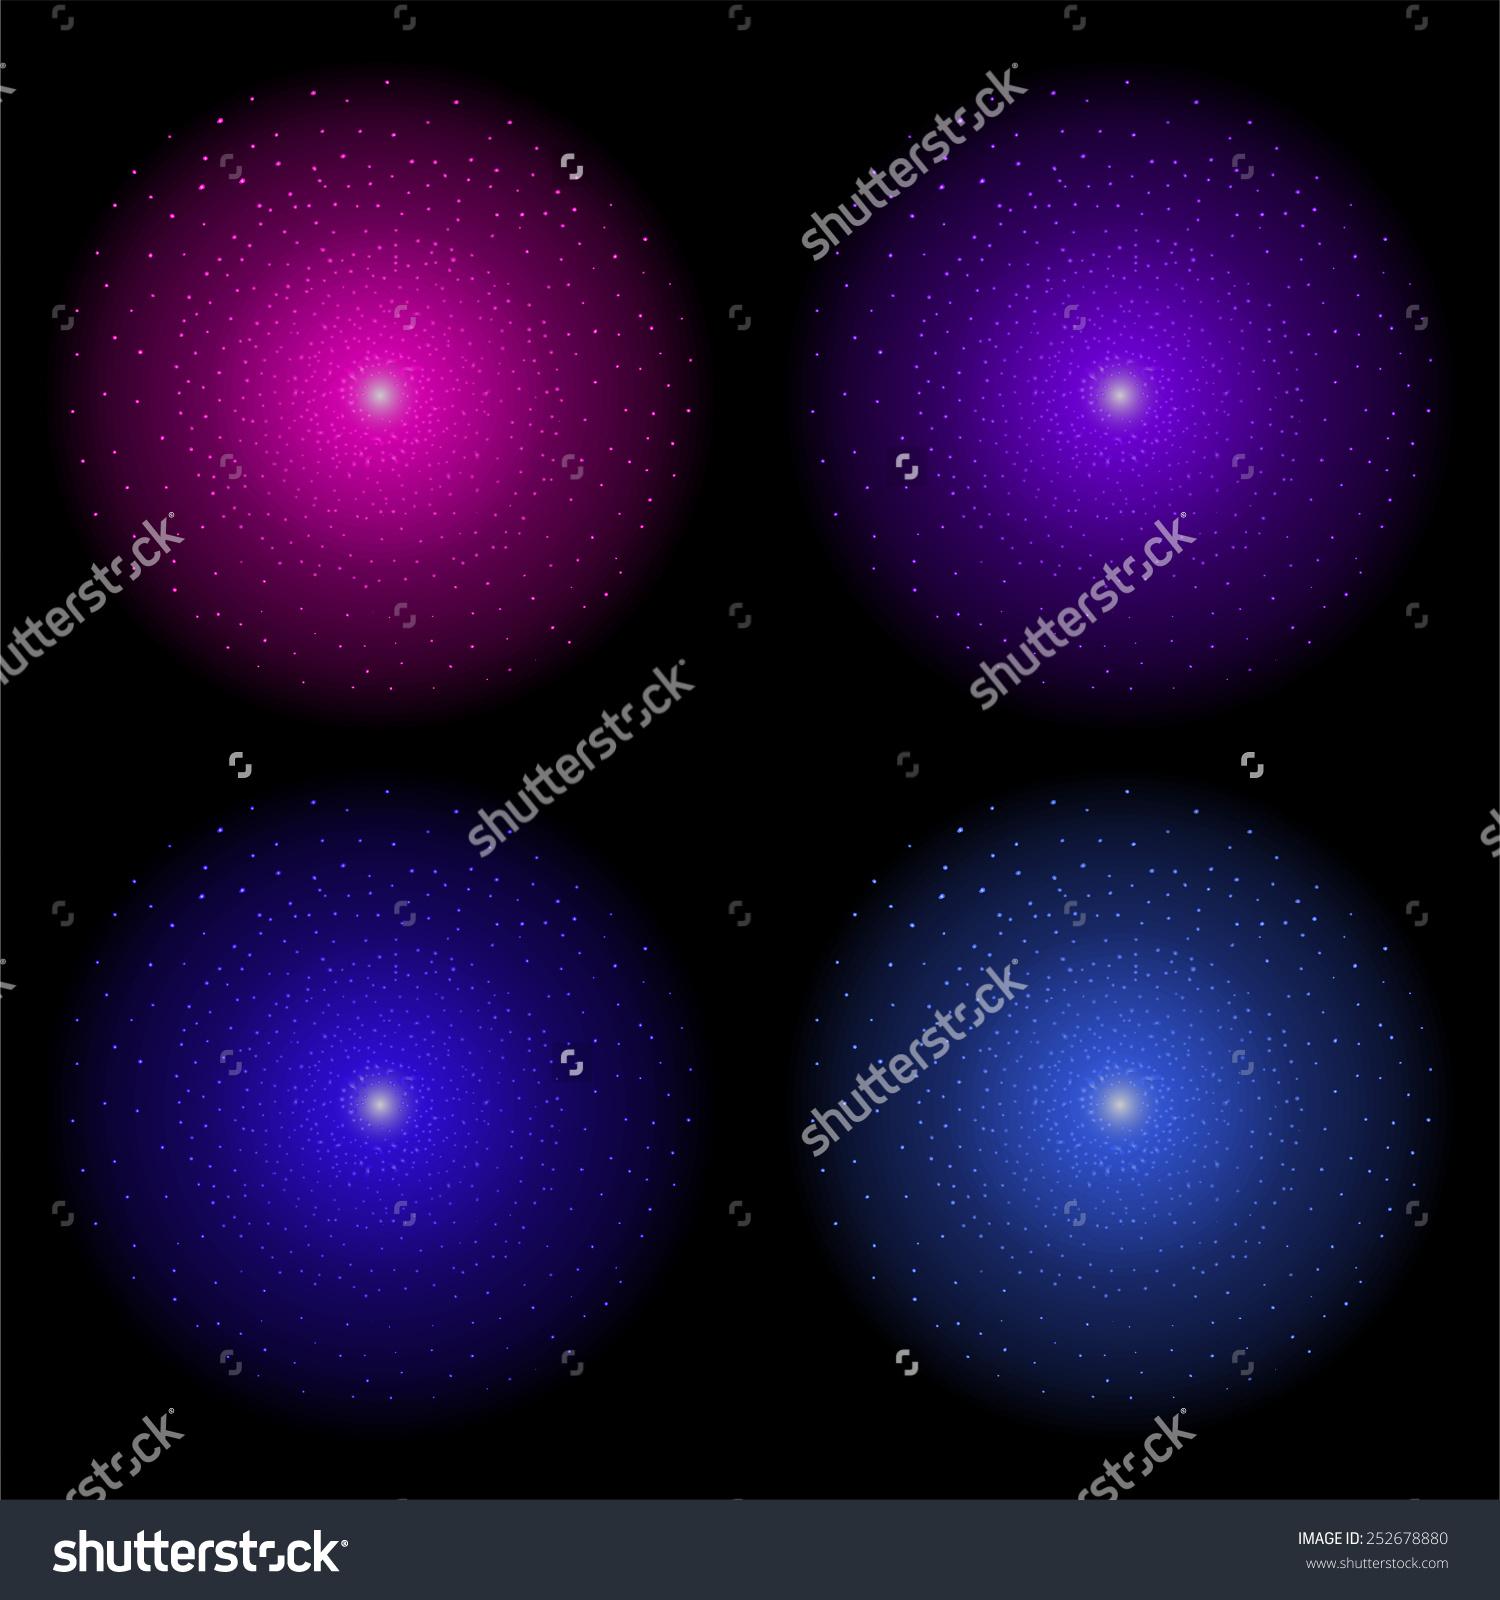 Galaxy Clipart Purple.